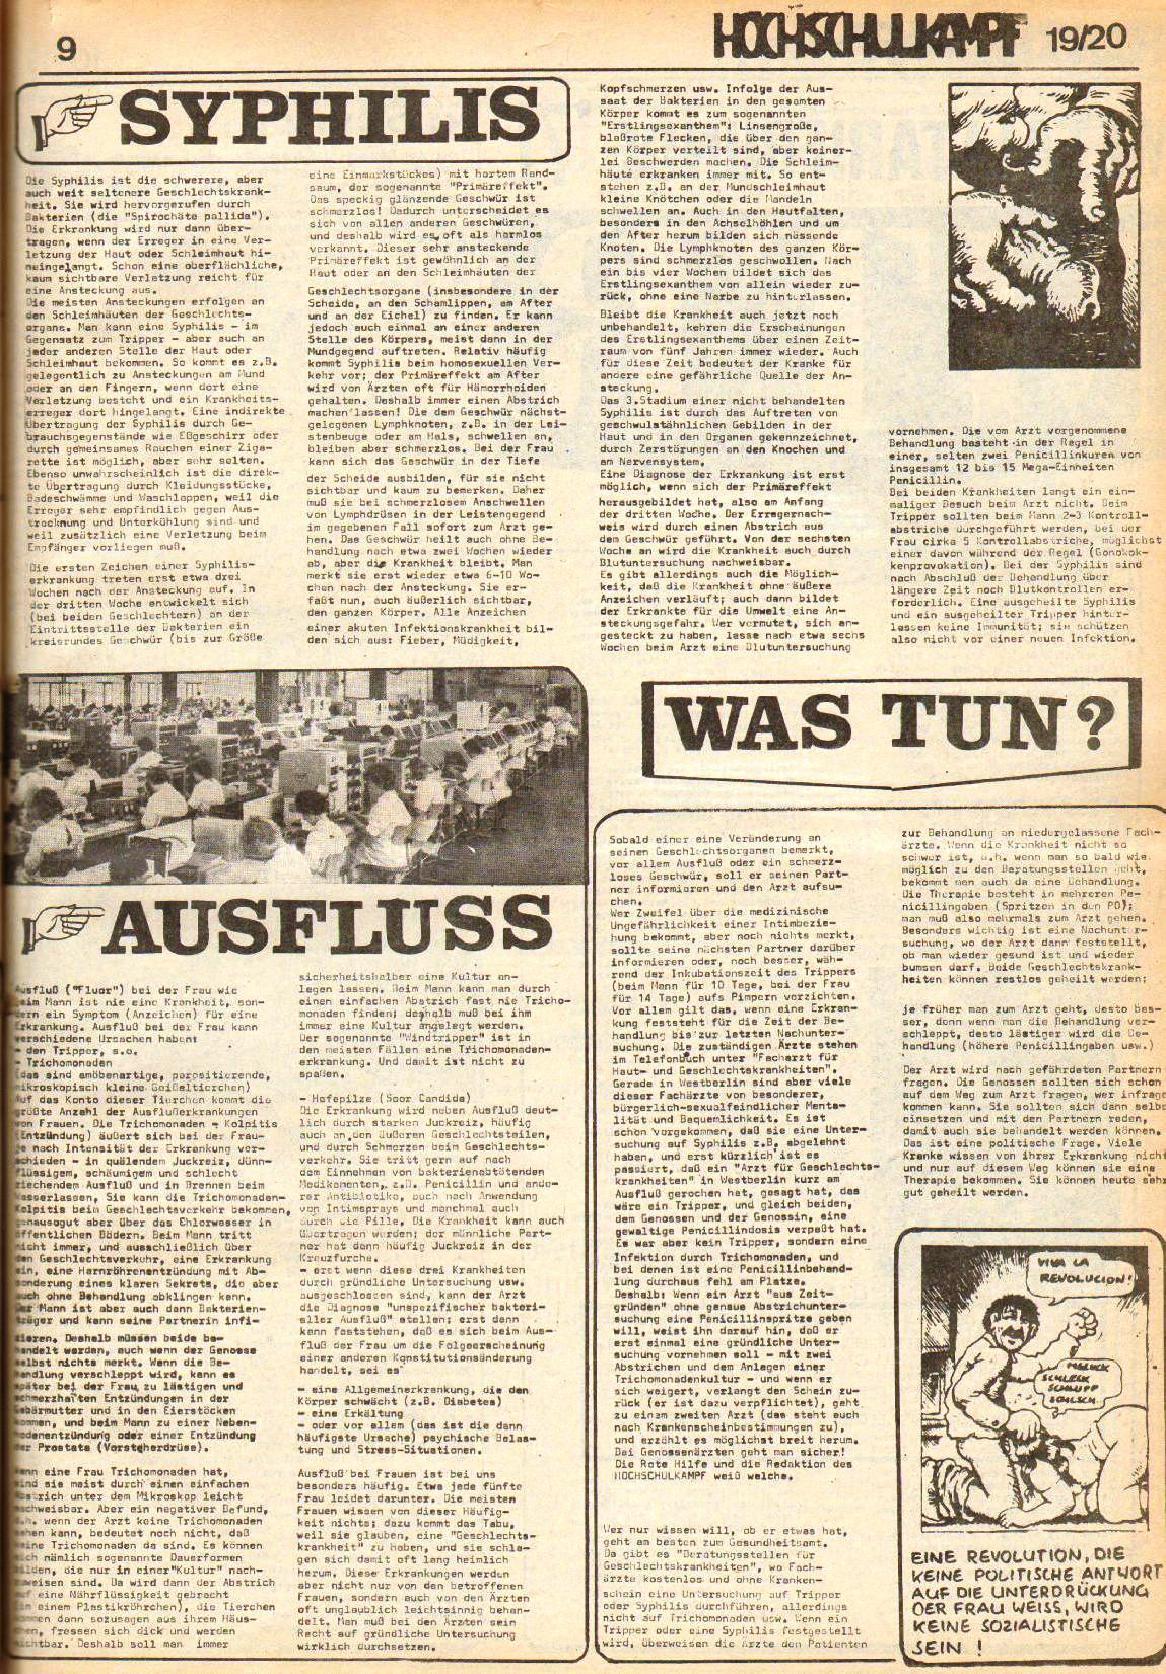 Berlin_Hochschulkampf_1971_19_09